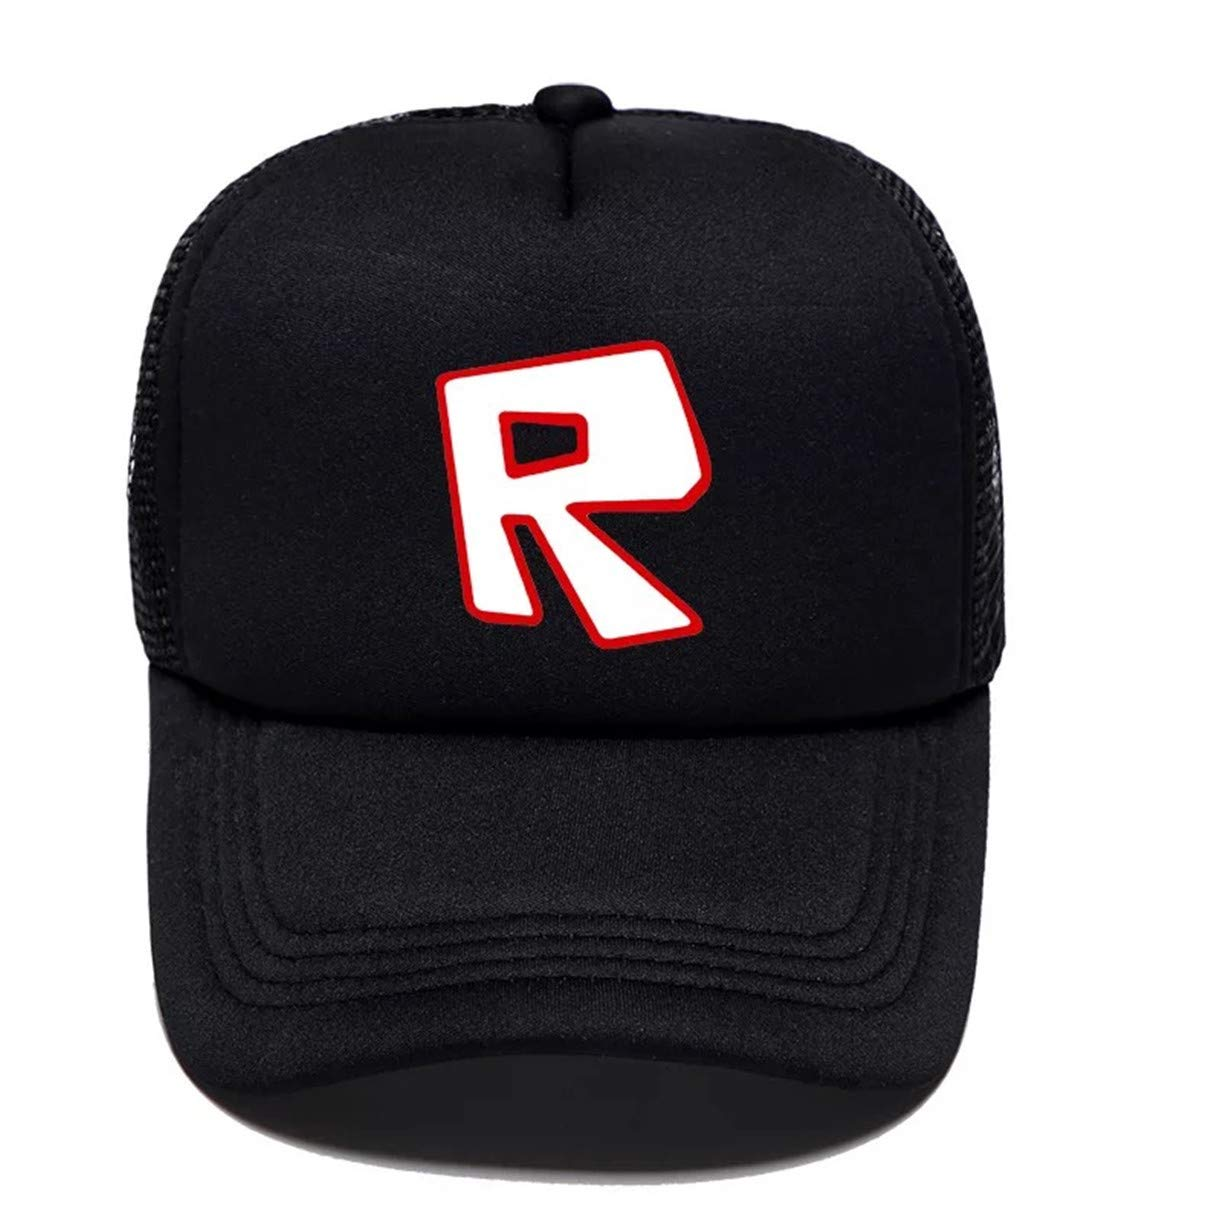 KK-Jim Kids Roblox Baseball Caps Hat-Adjustable Roblox Peaked Caps for Boys Girls